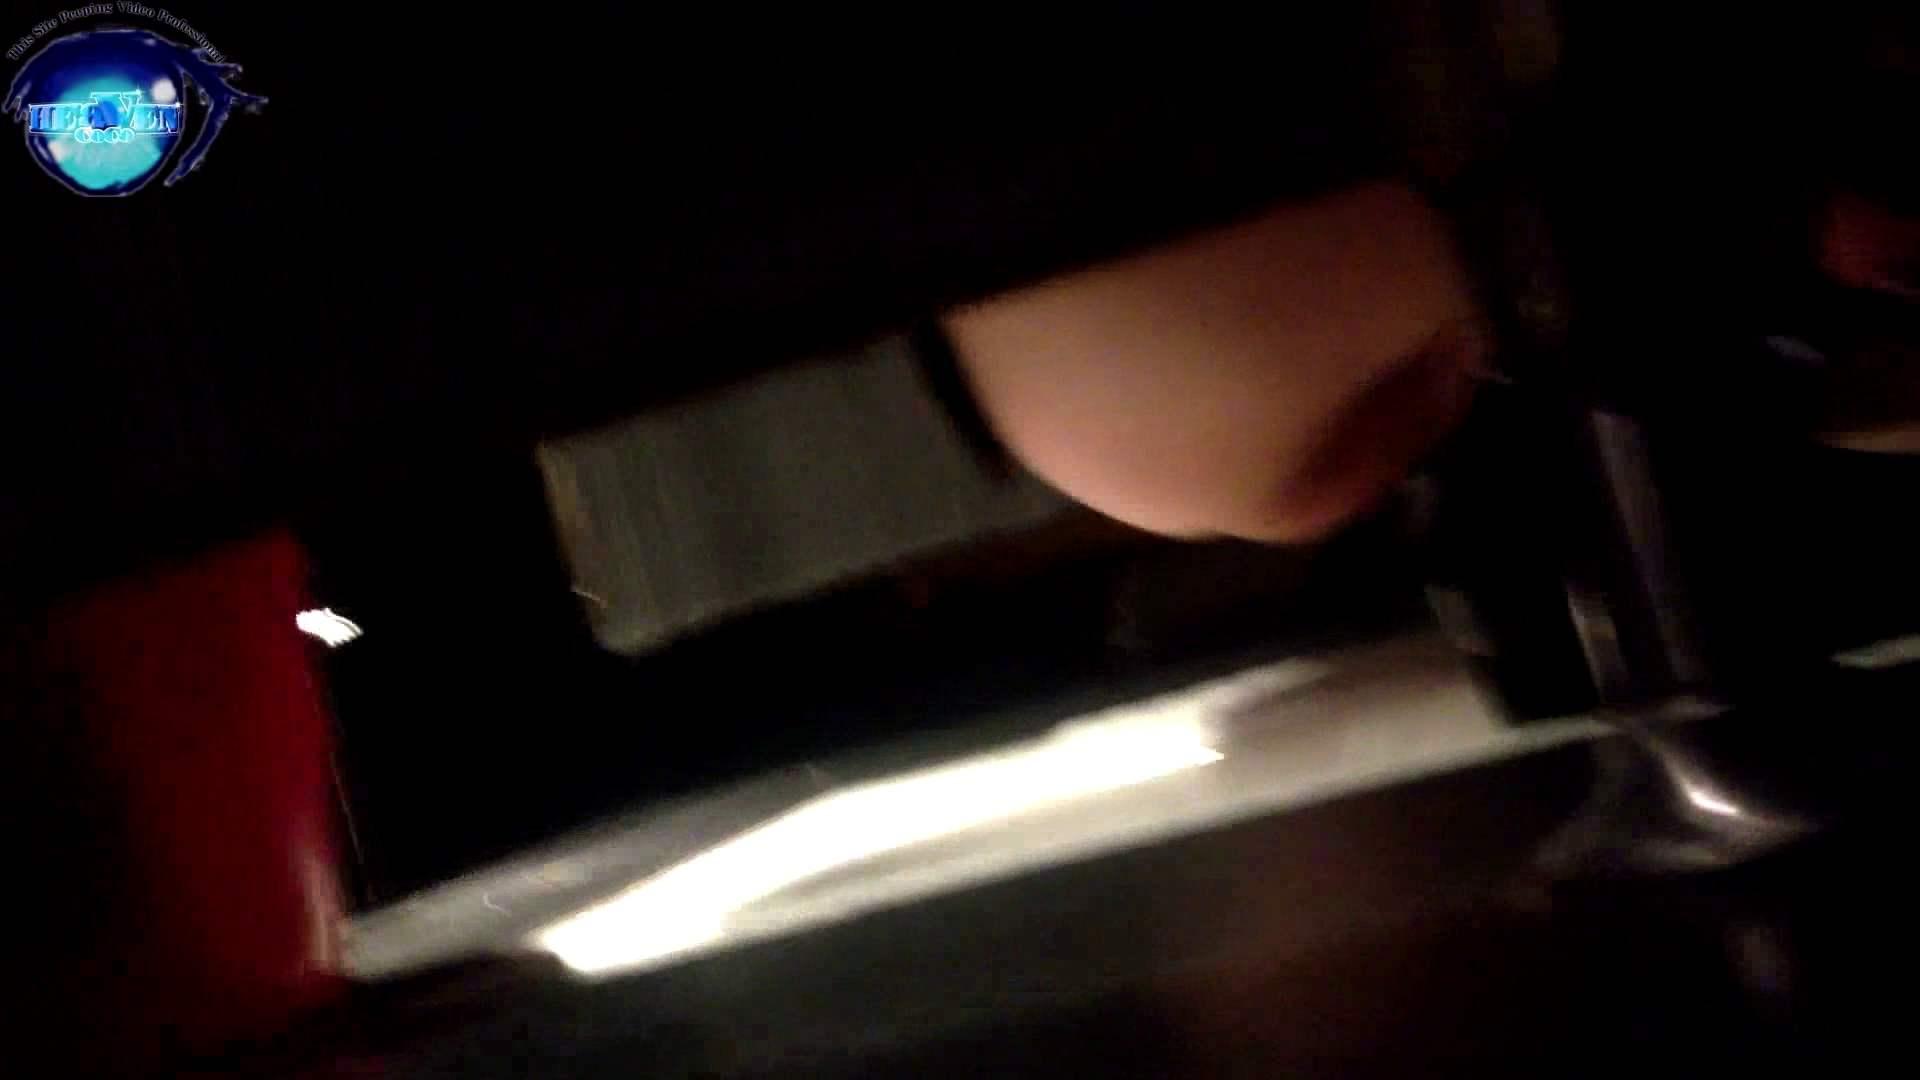 GOD HAND ファッションショッピングセンター盗撮vol.02前編 盗撮 ワレメ無修正動画無料 74連発 65